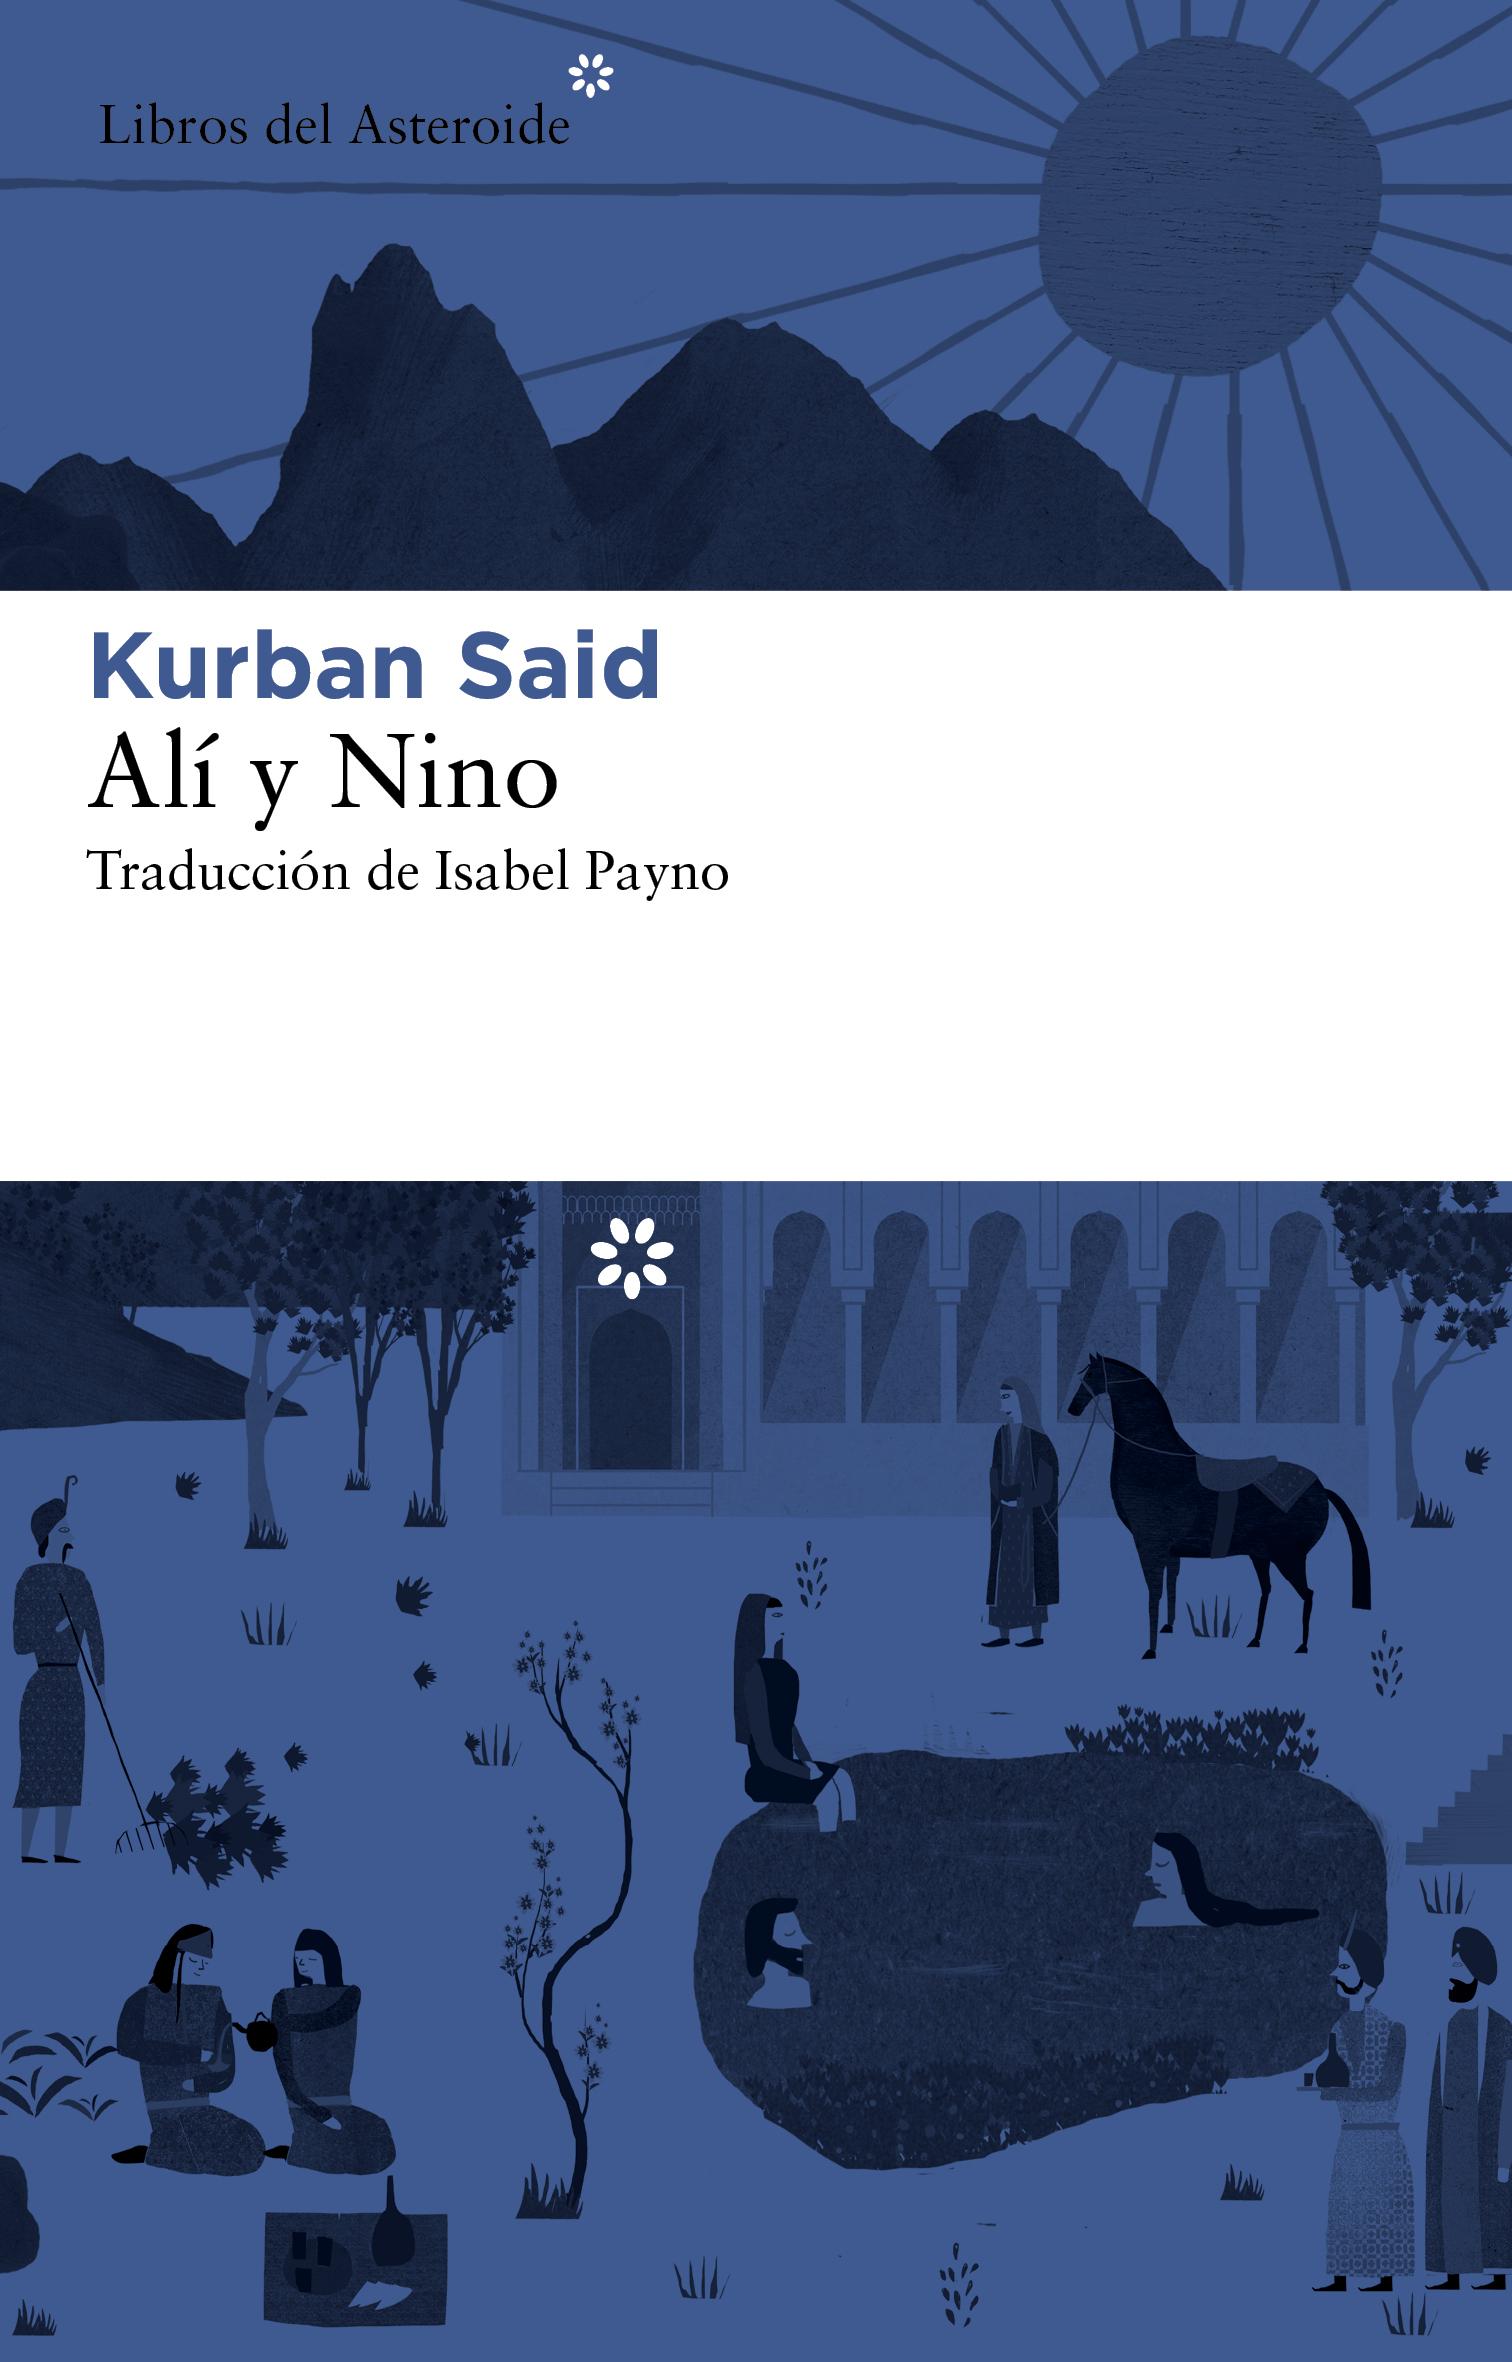 ALÍ Y NINO – Kurban Said